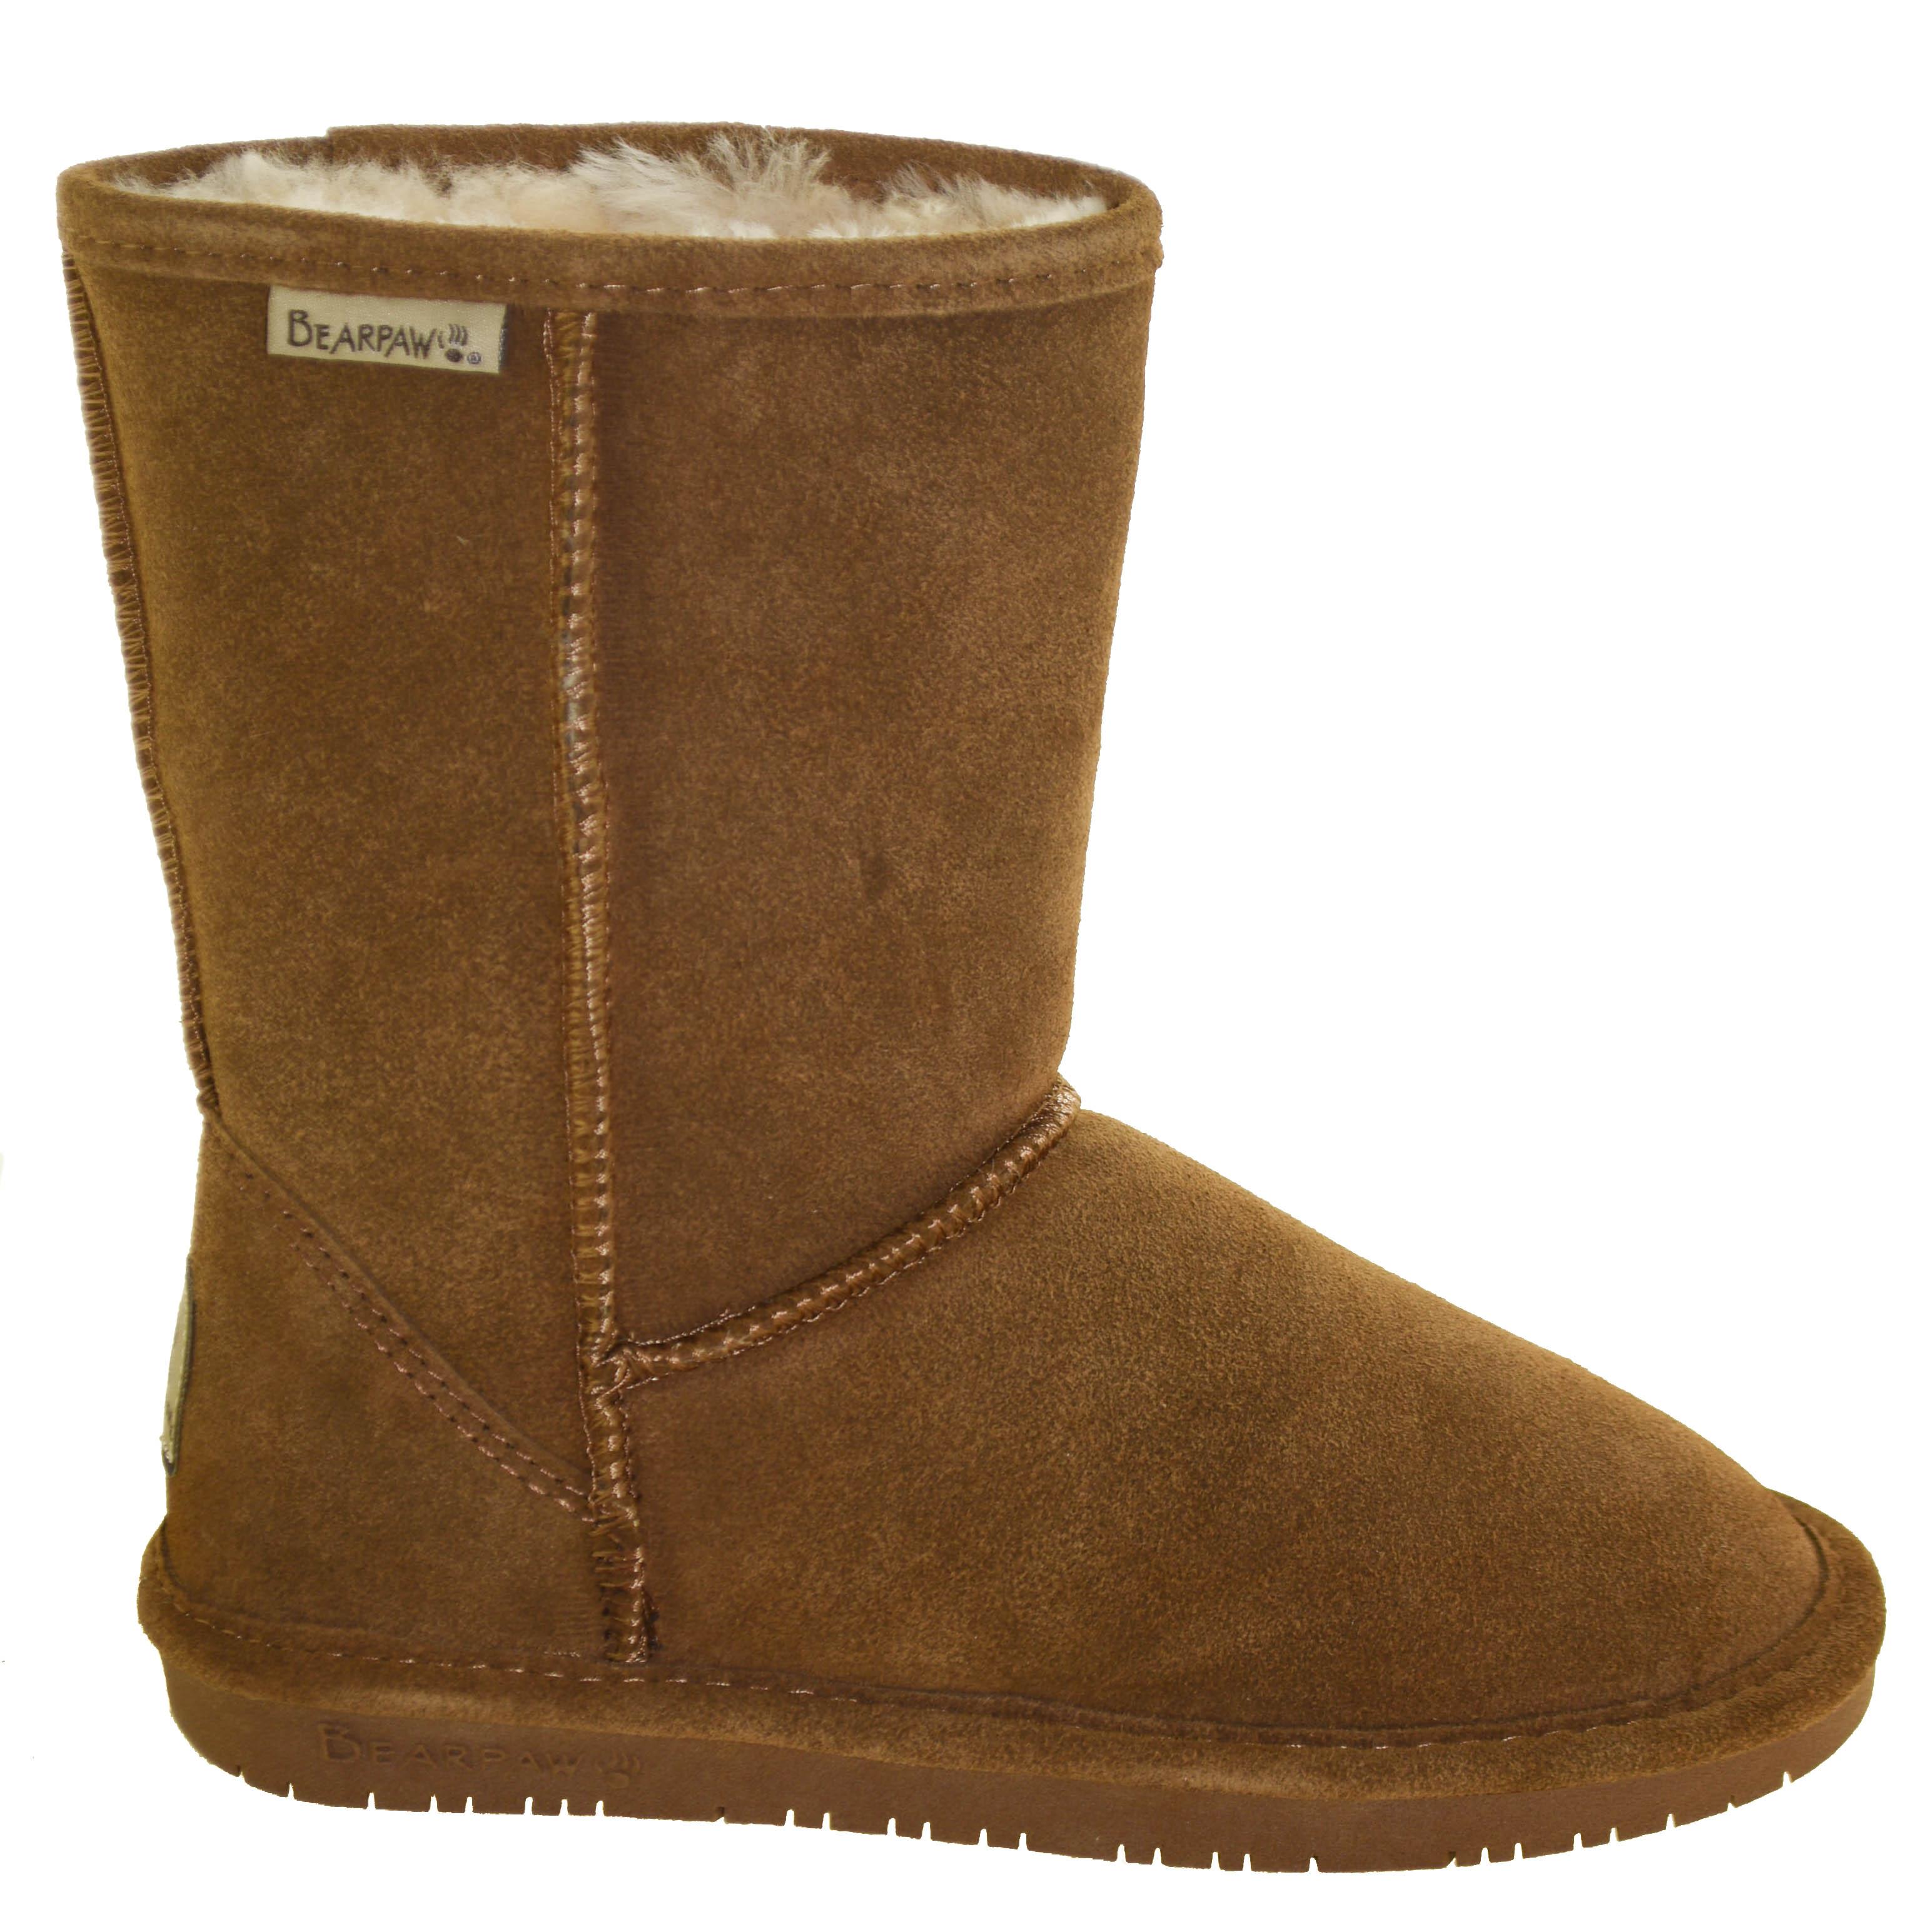 cf847da2569b Bearpaw Women s Emma Short Wide Winter Boot Style 609W Hickory